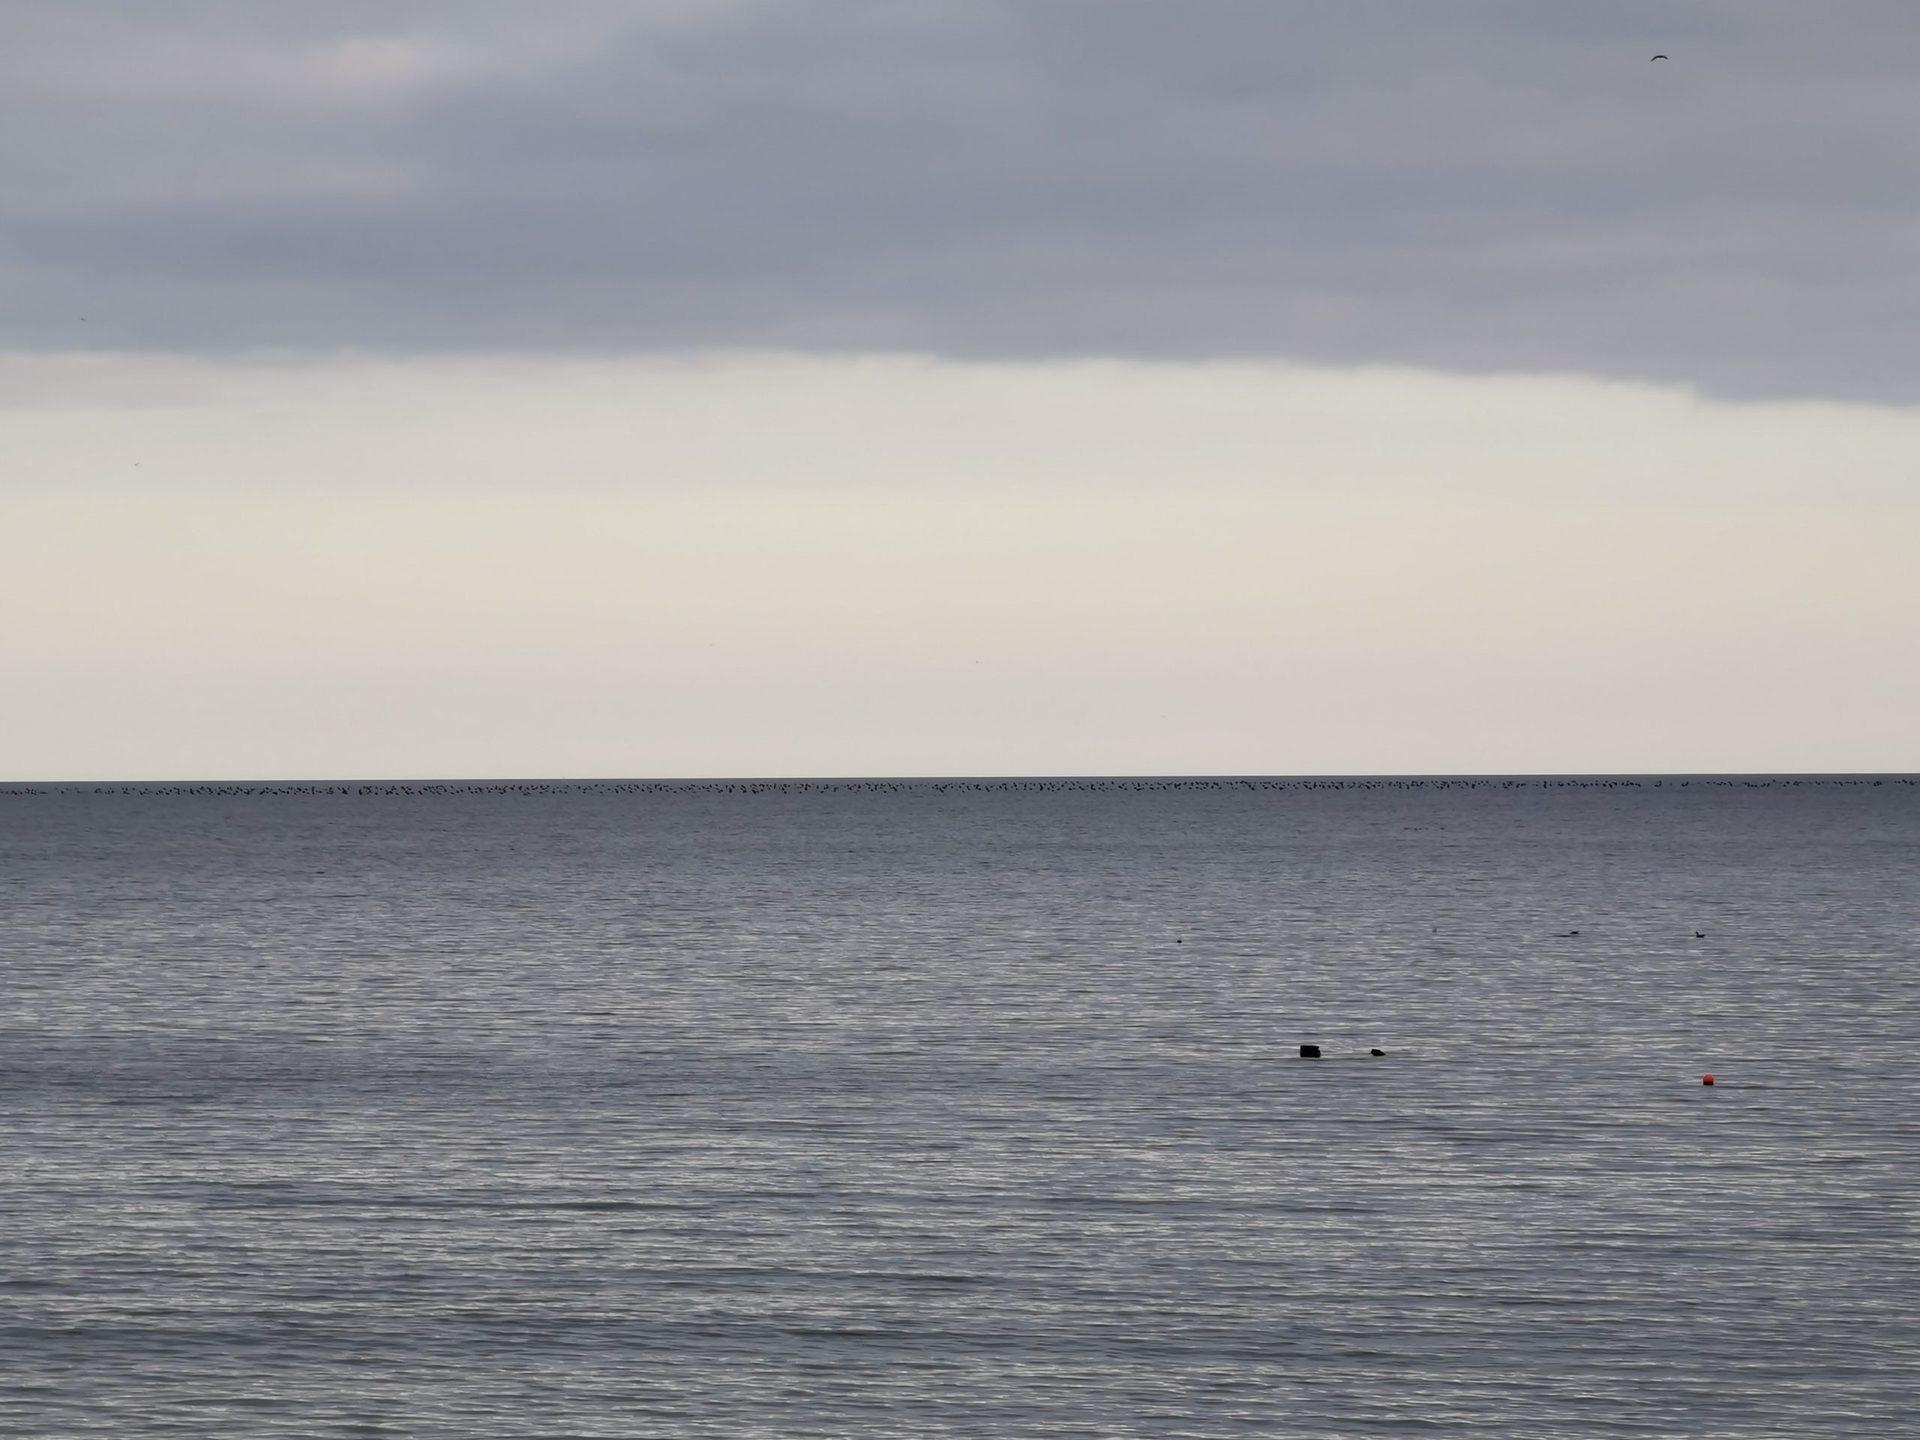 Huawei P30 Pro 5x photo sample of the sea